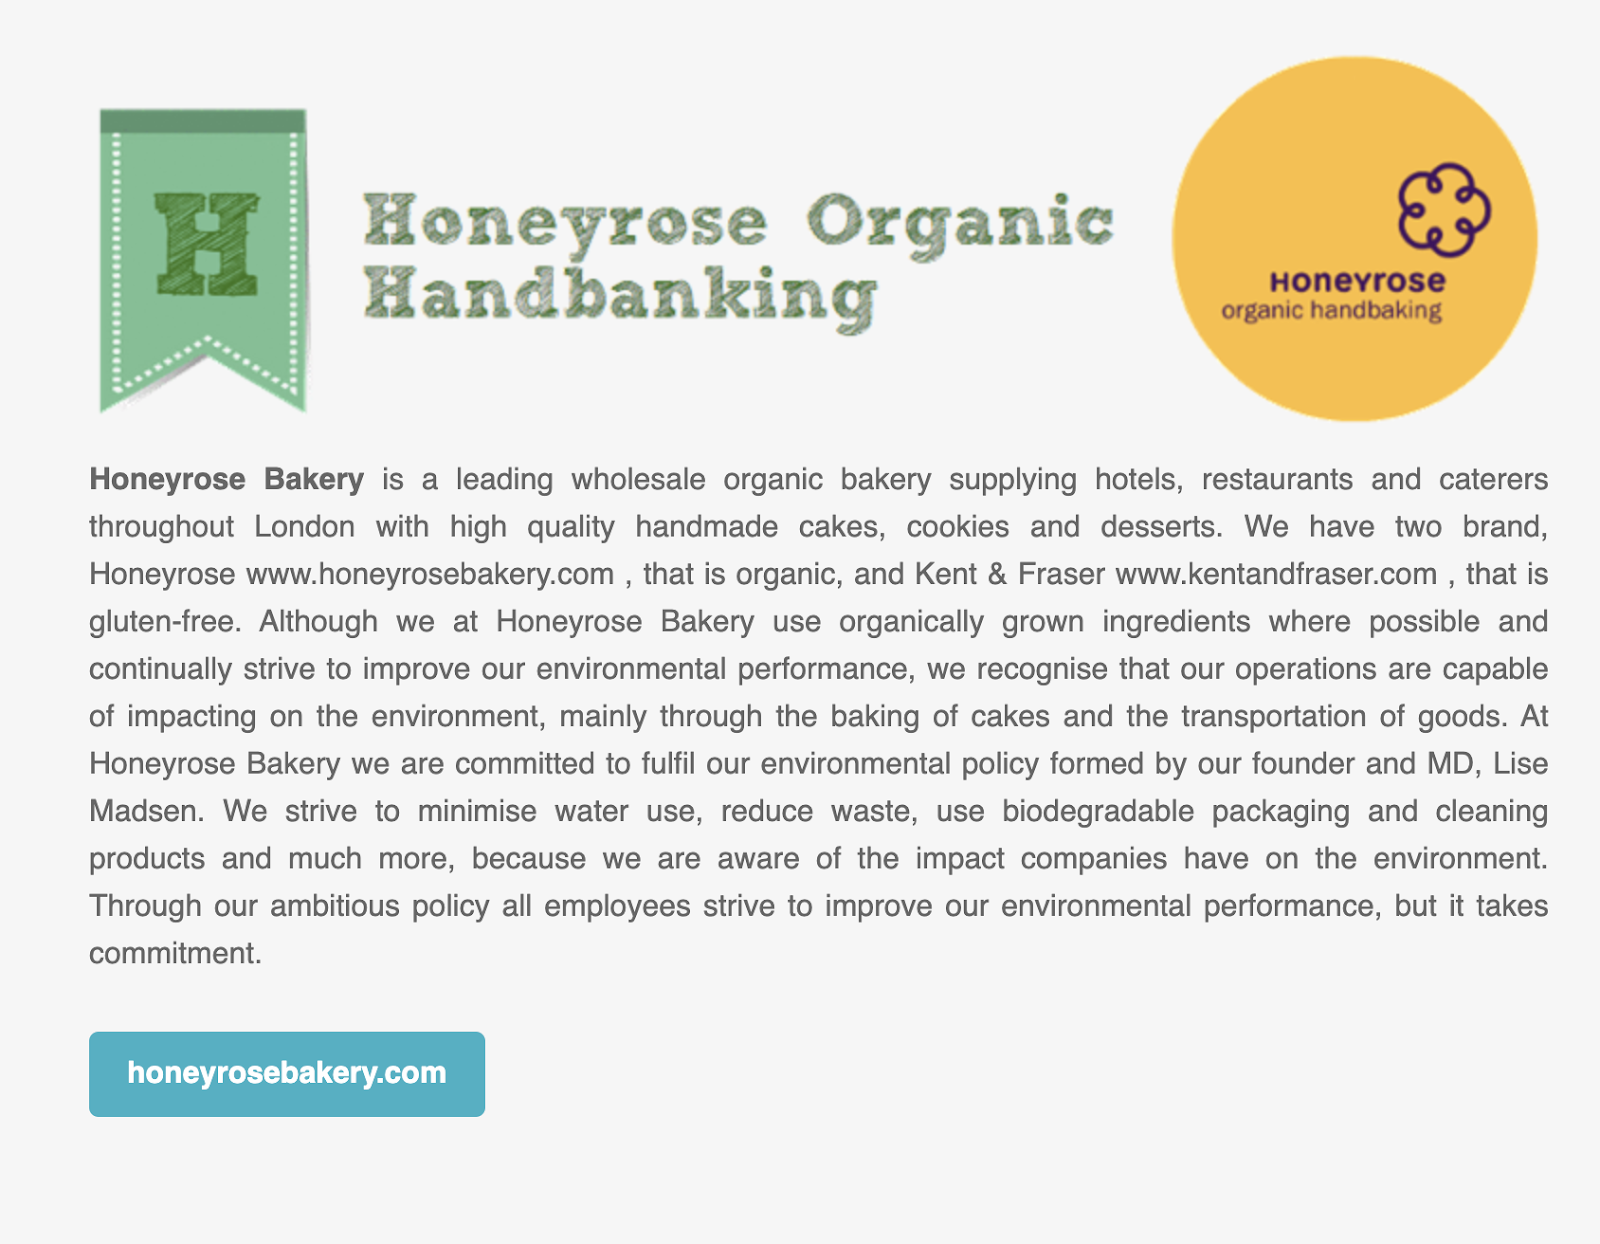 honeyrose organic handbaking